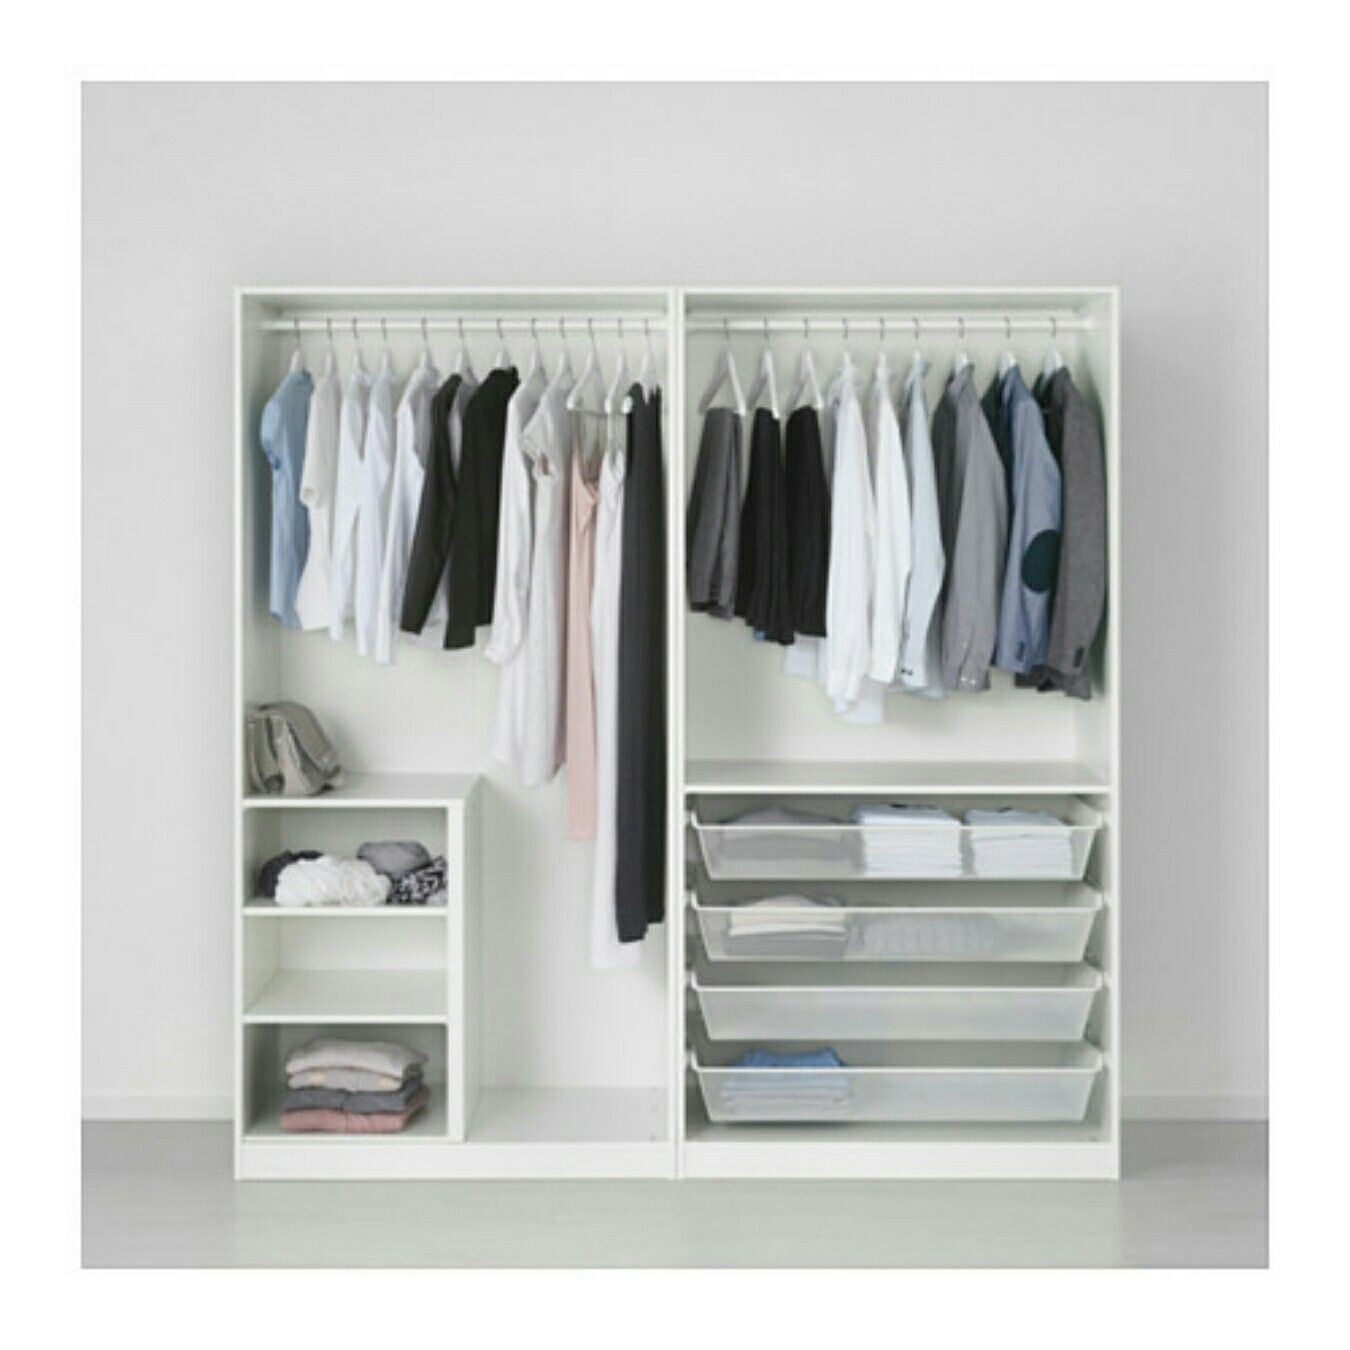 Pin by Shawnna Brown on Stuff to Buy Pax wardrobe, Ikea